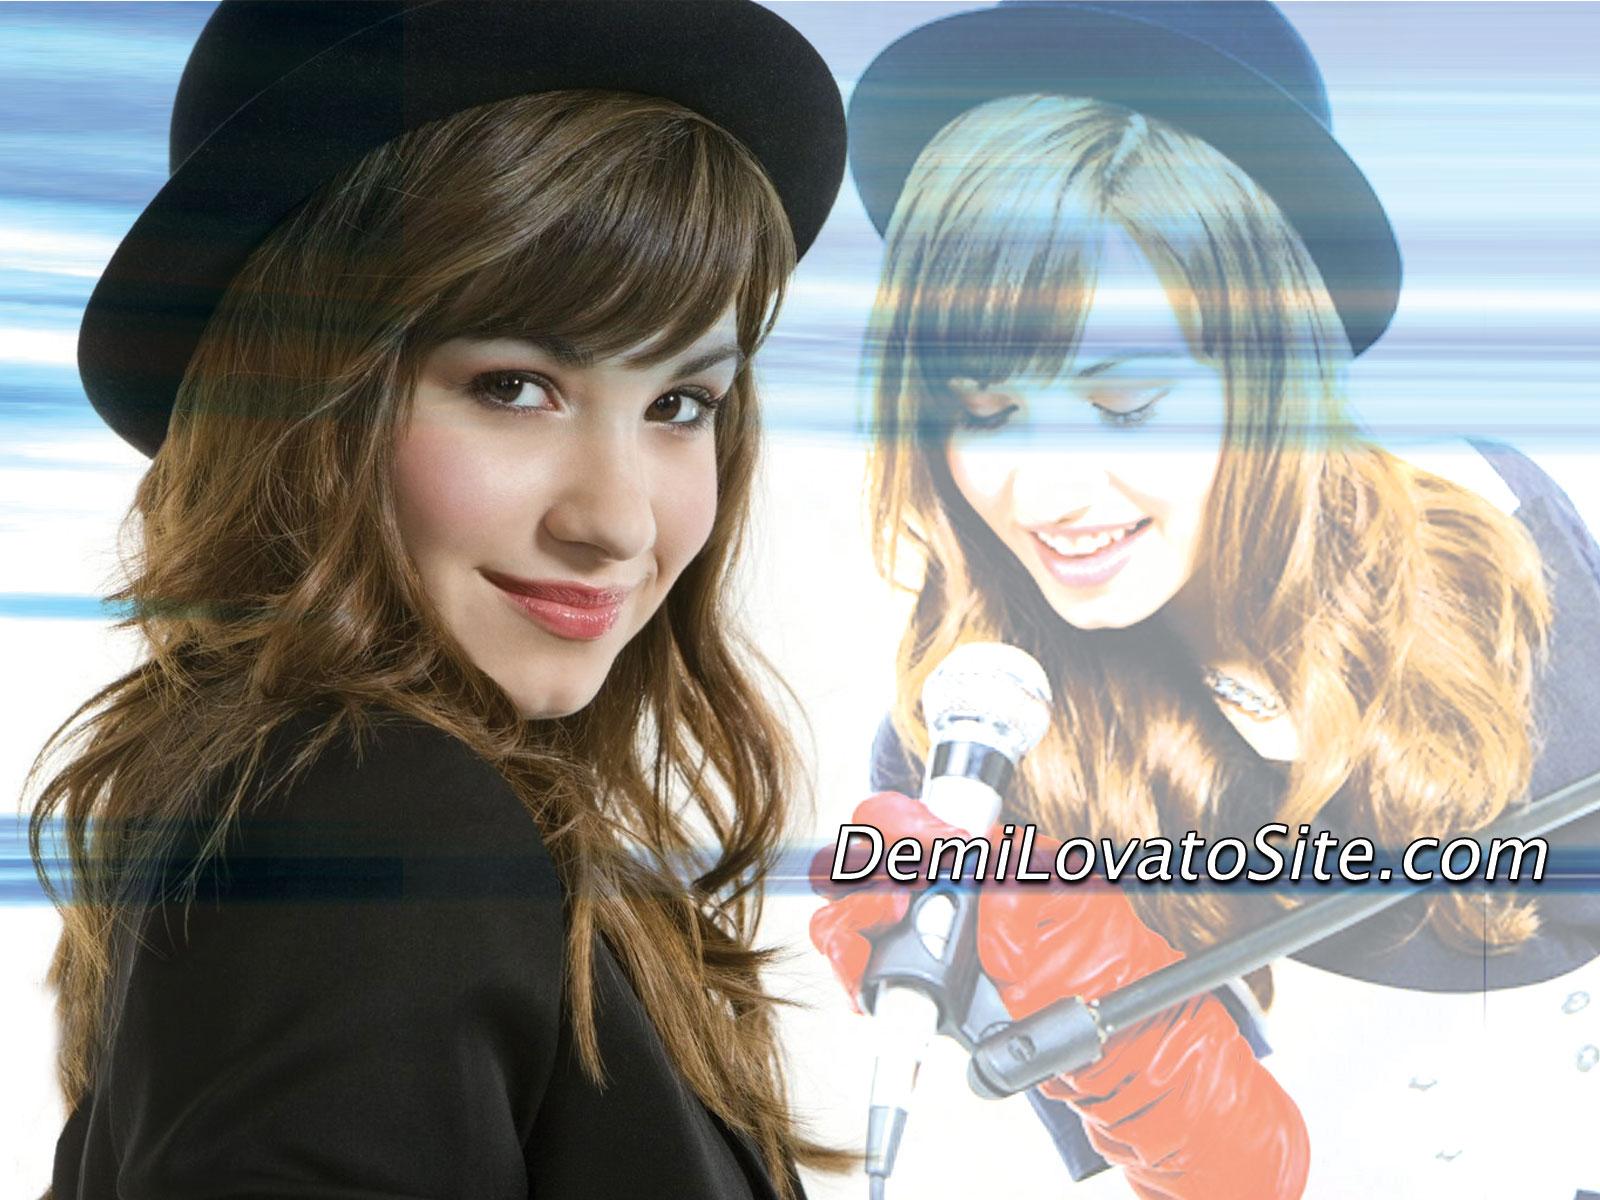 http://3.bp.blogspot.com/-vf_-Ik75cl4/TyrLpXmBA6I/AAAAAAAAAC0/NGXPACHZNJY/s1600/Demi-Lovato-Wallpaper+2.jpg